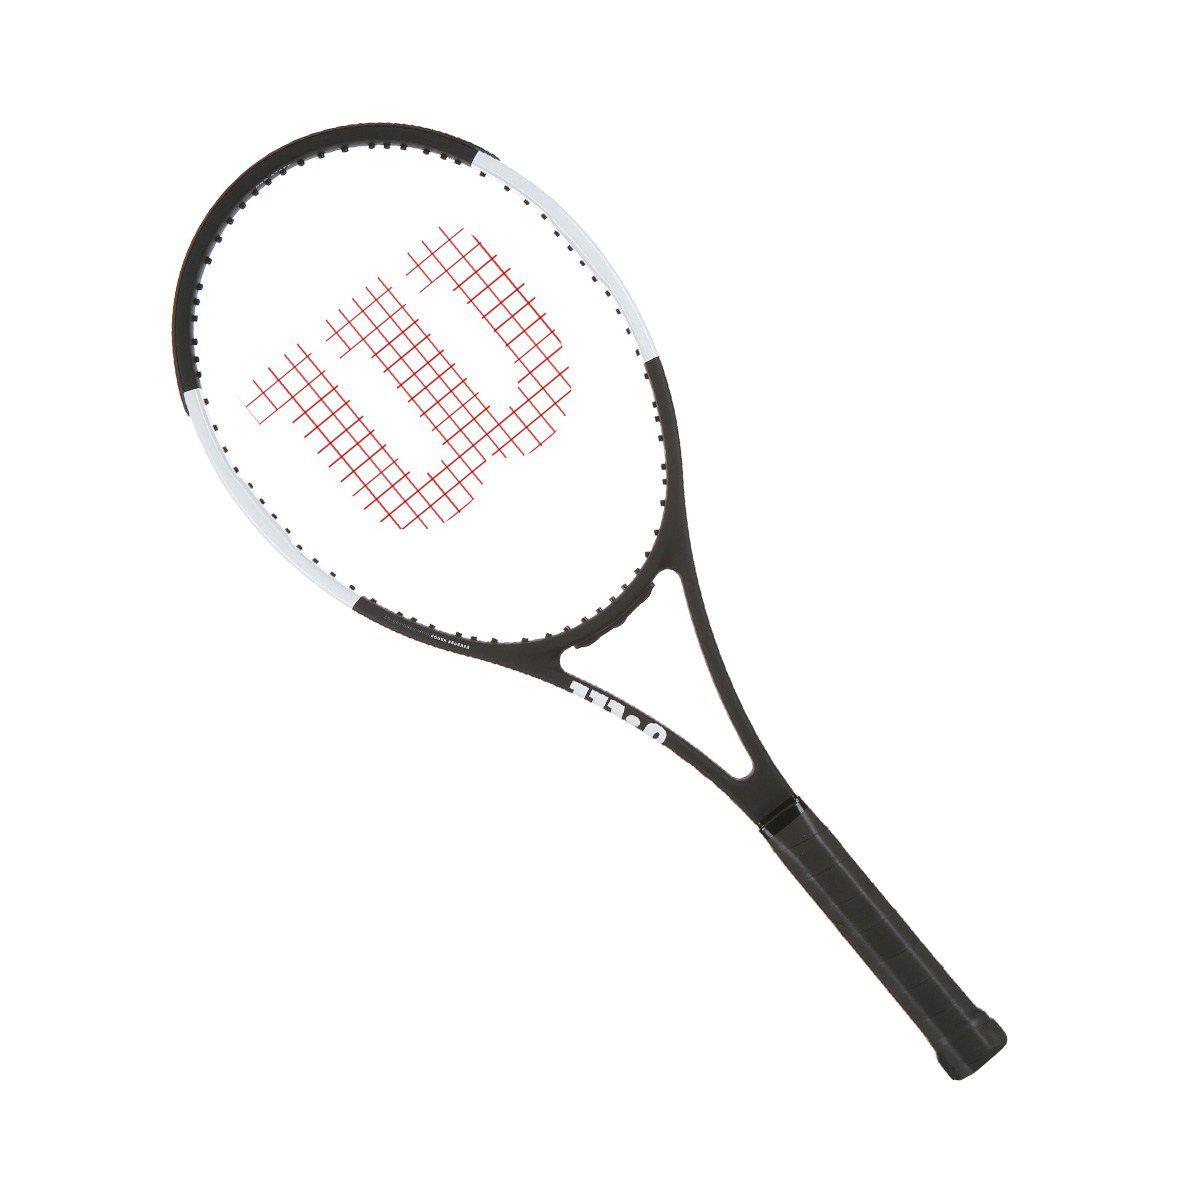 Raquete de Tênis Wilson Pro Staff 97 Countervail (315g)